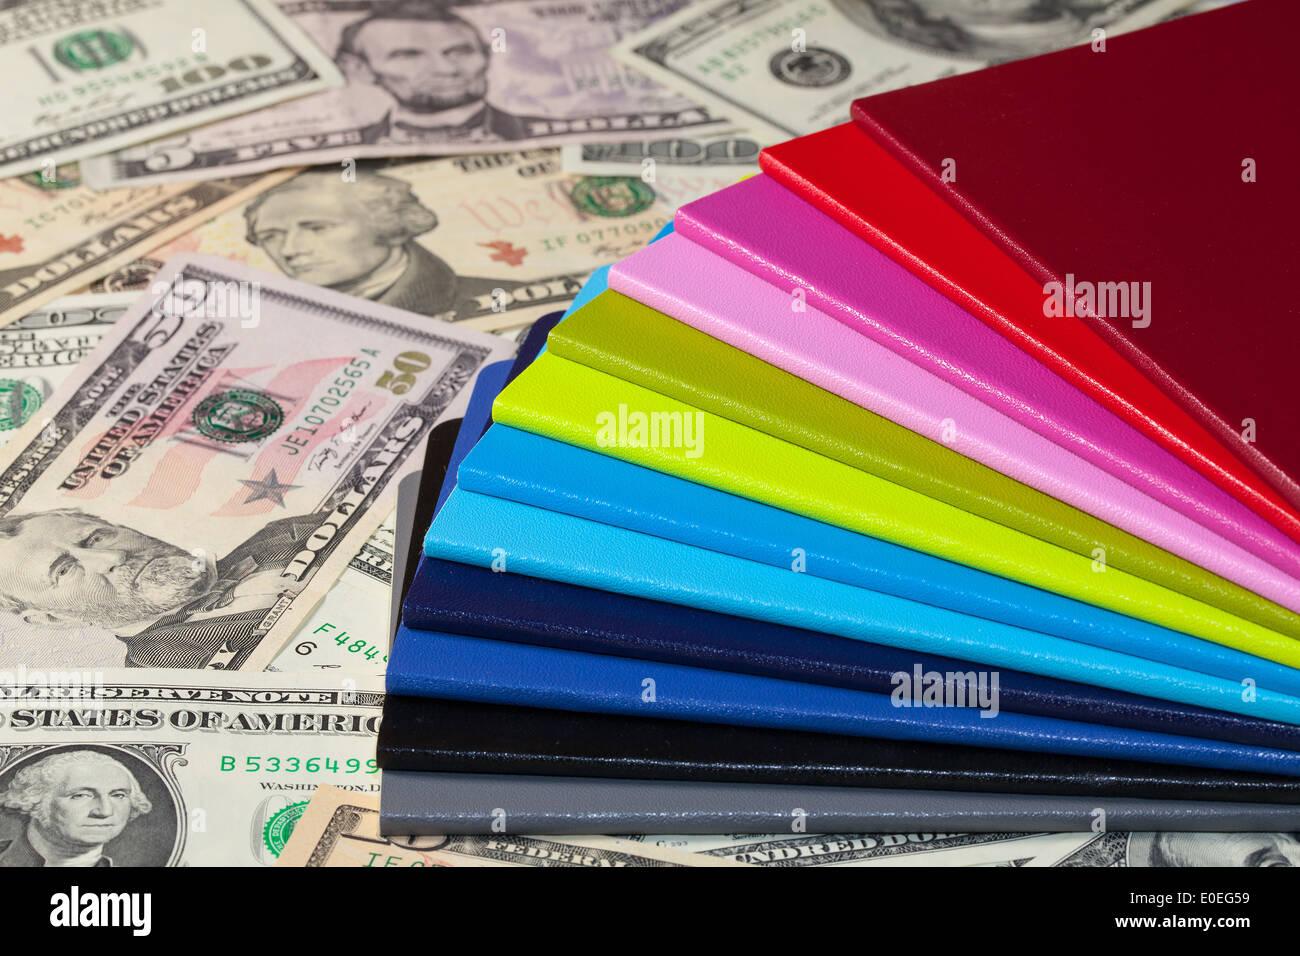 Twelve different diaries and U.S. dollars - Stock Image